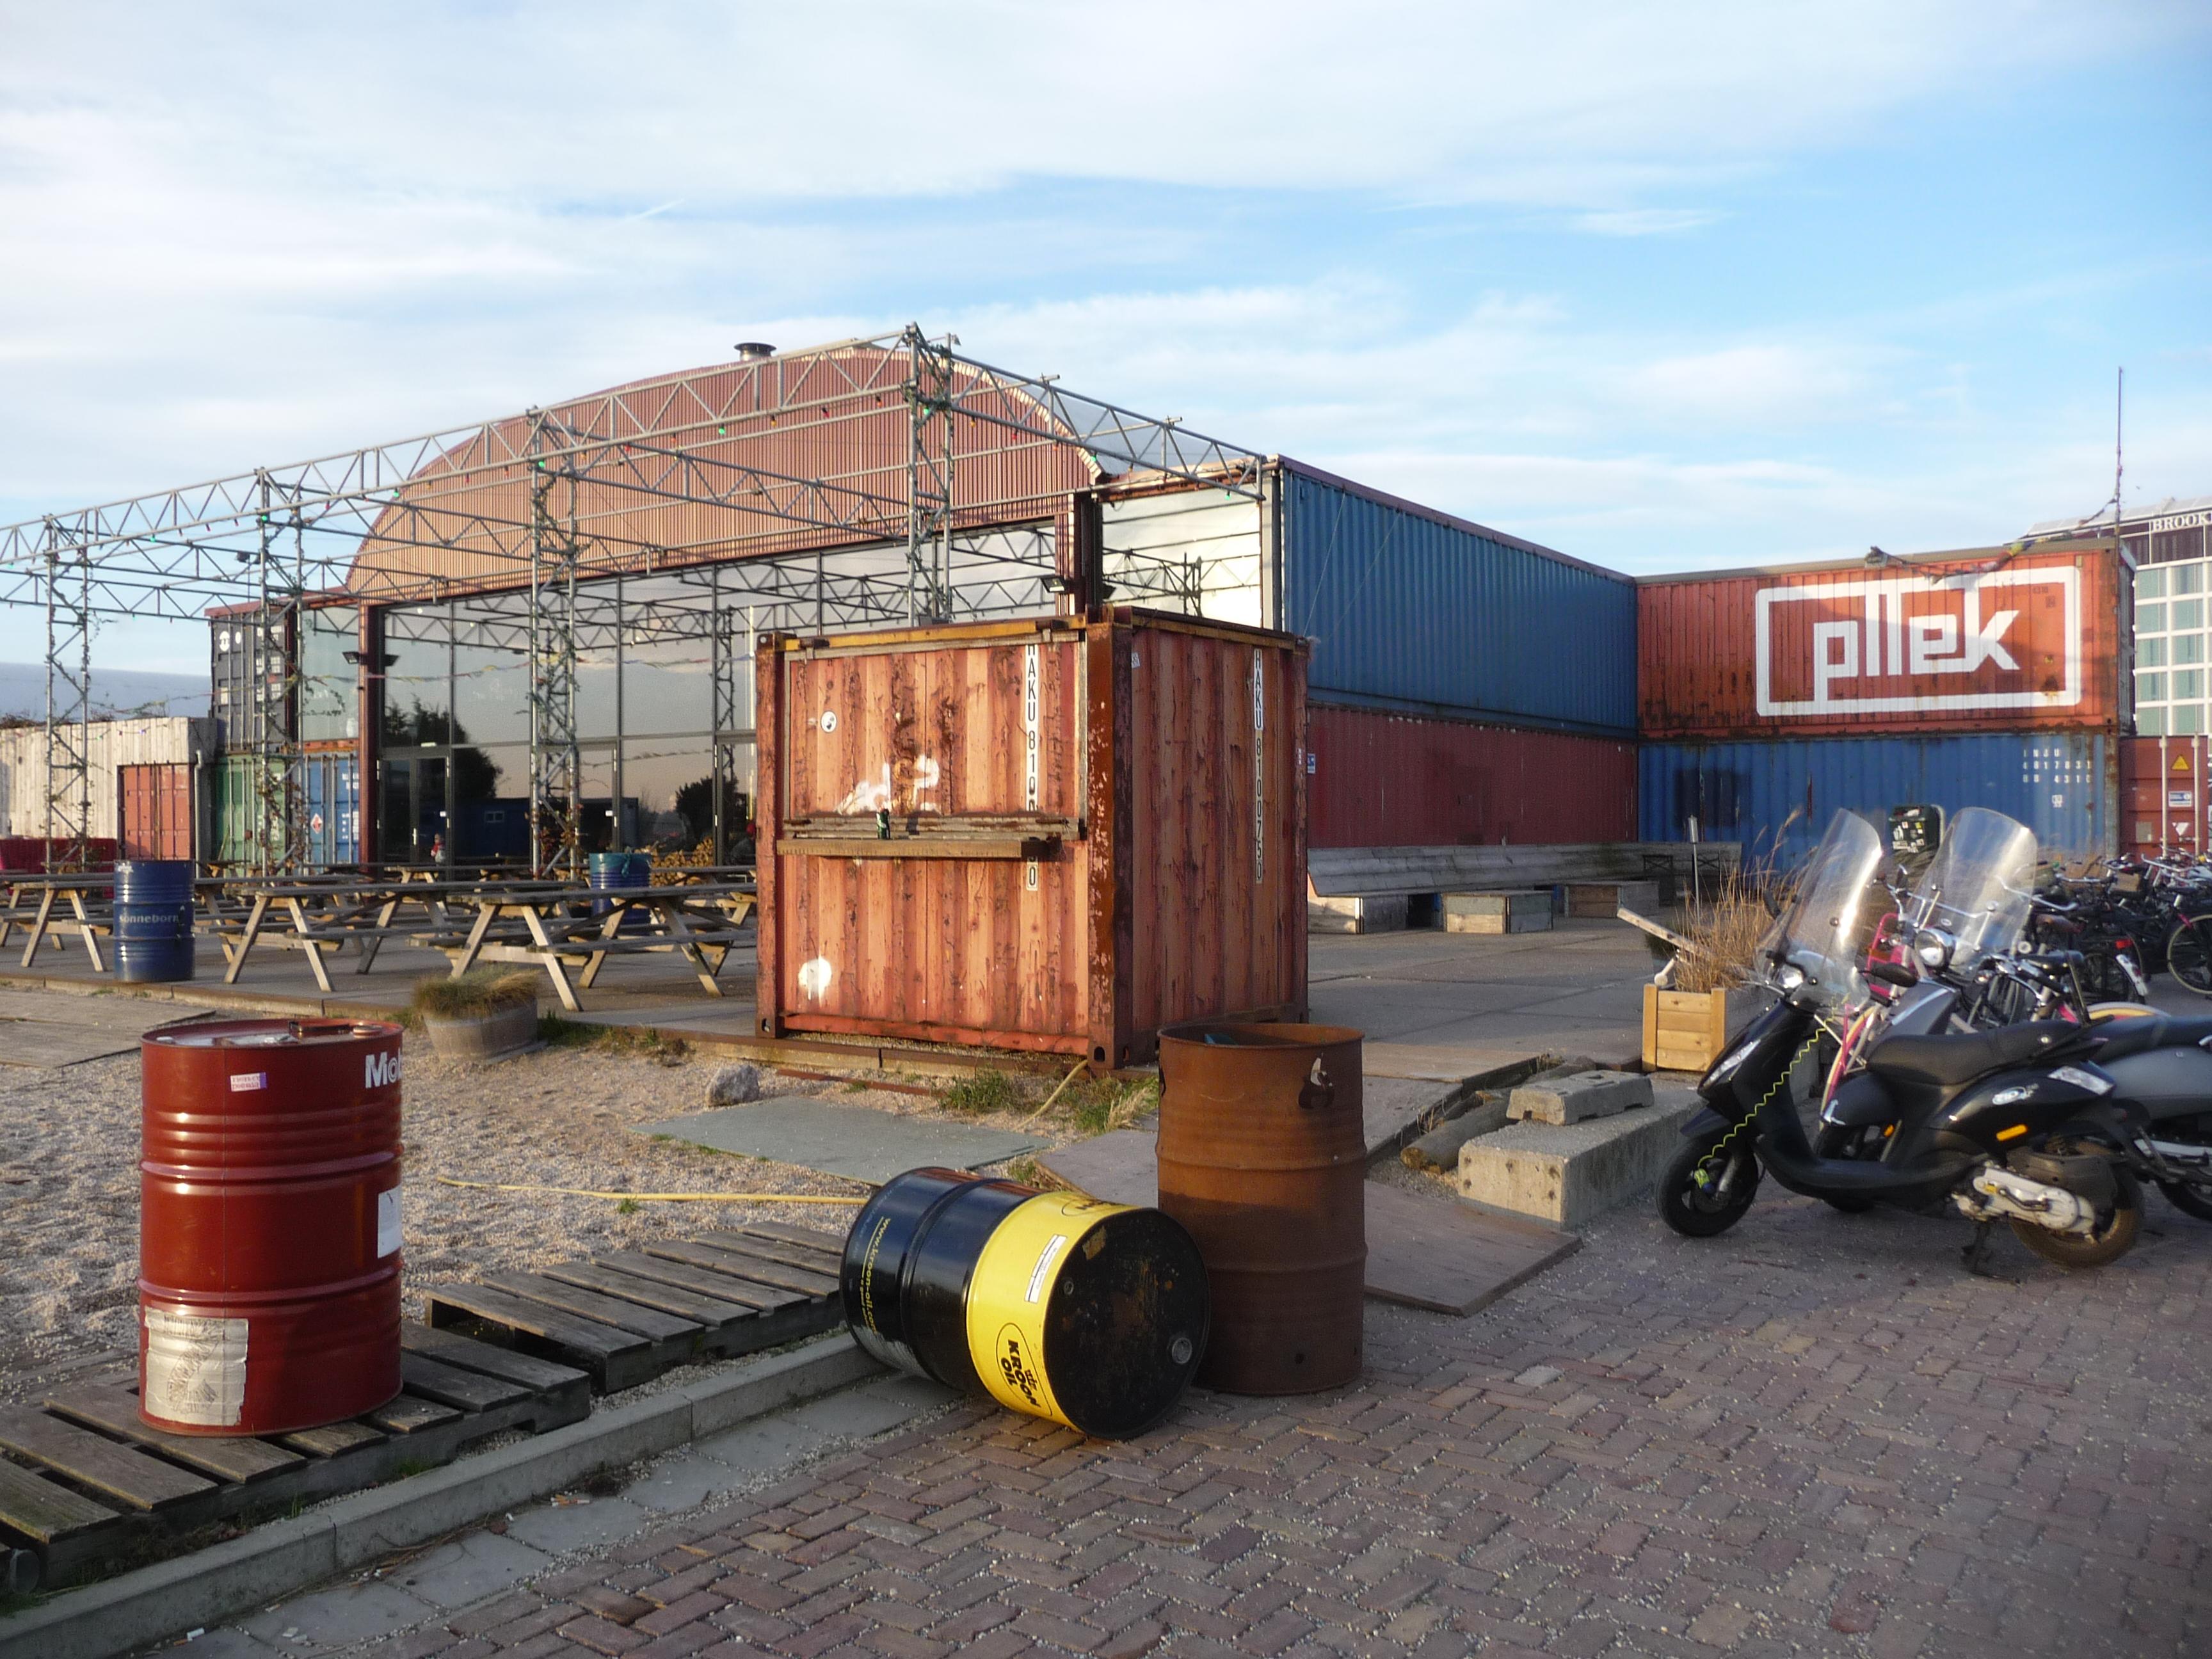 decouvrir le Pllek a Amsterdam